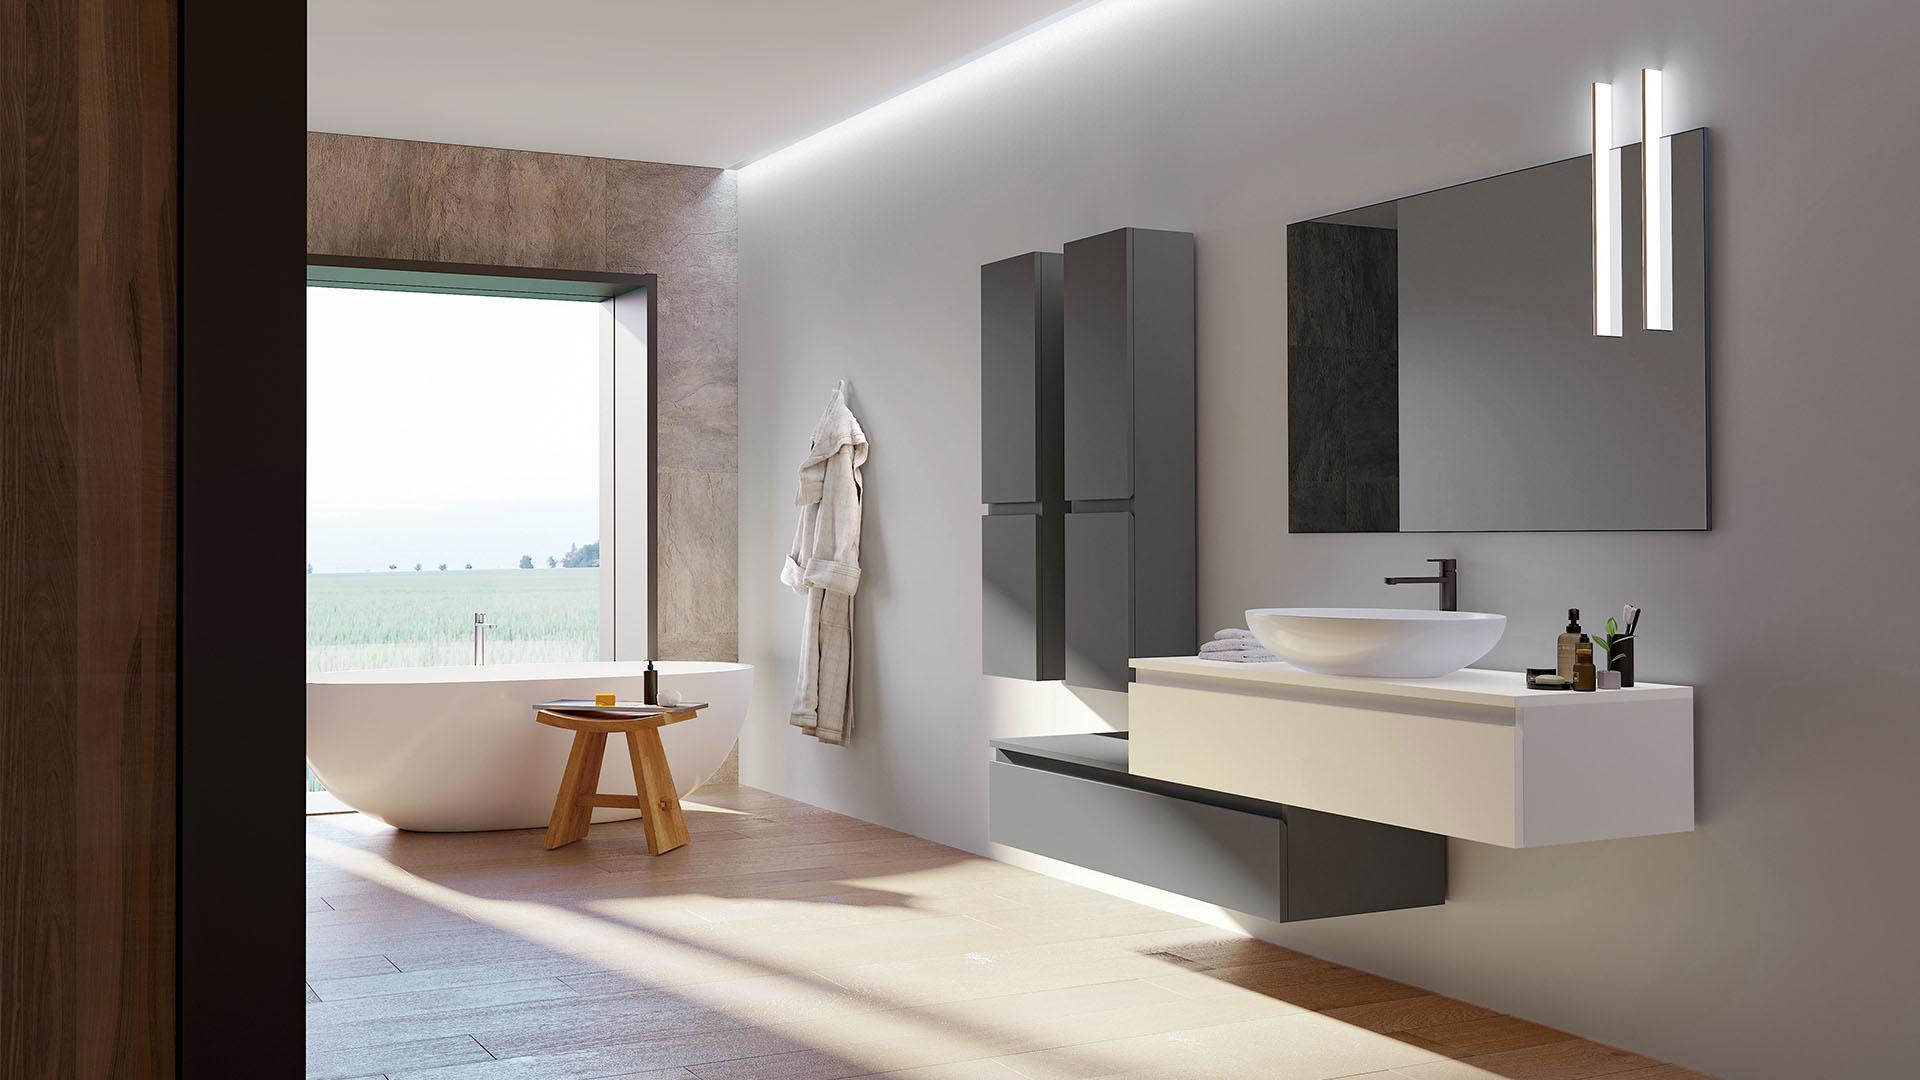 Bathroom Happy 13 - Licor Design